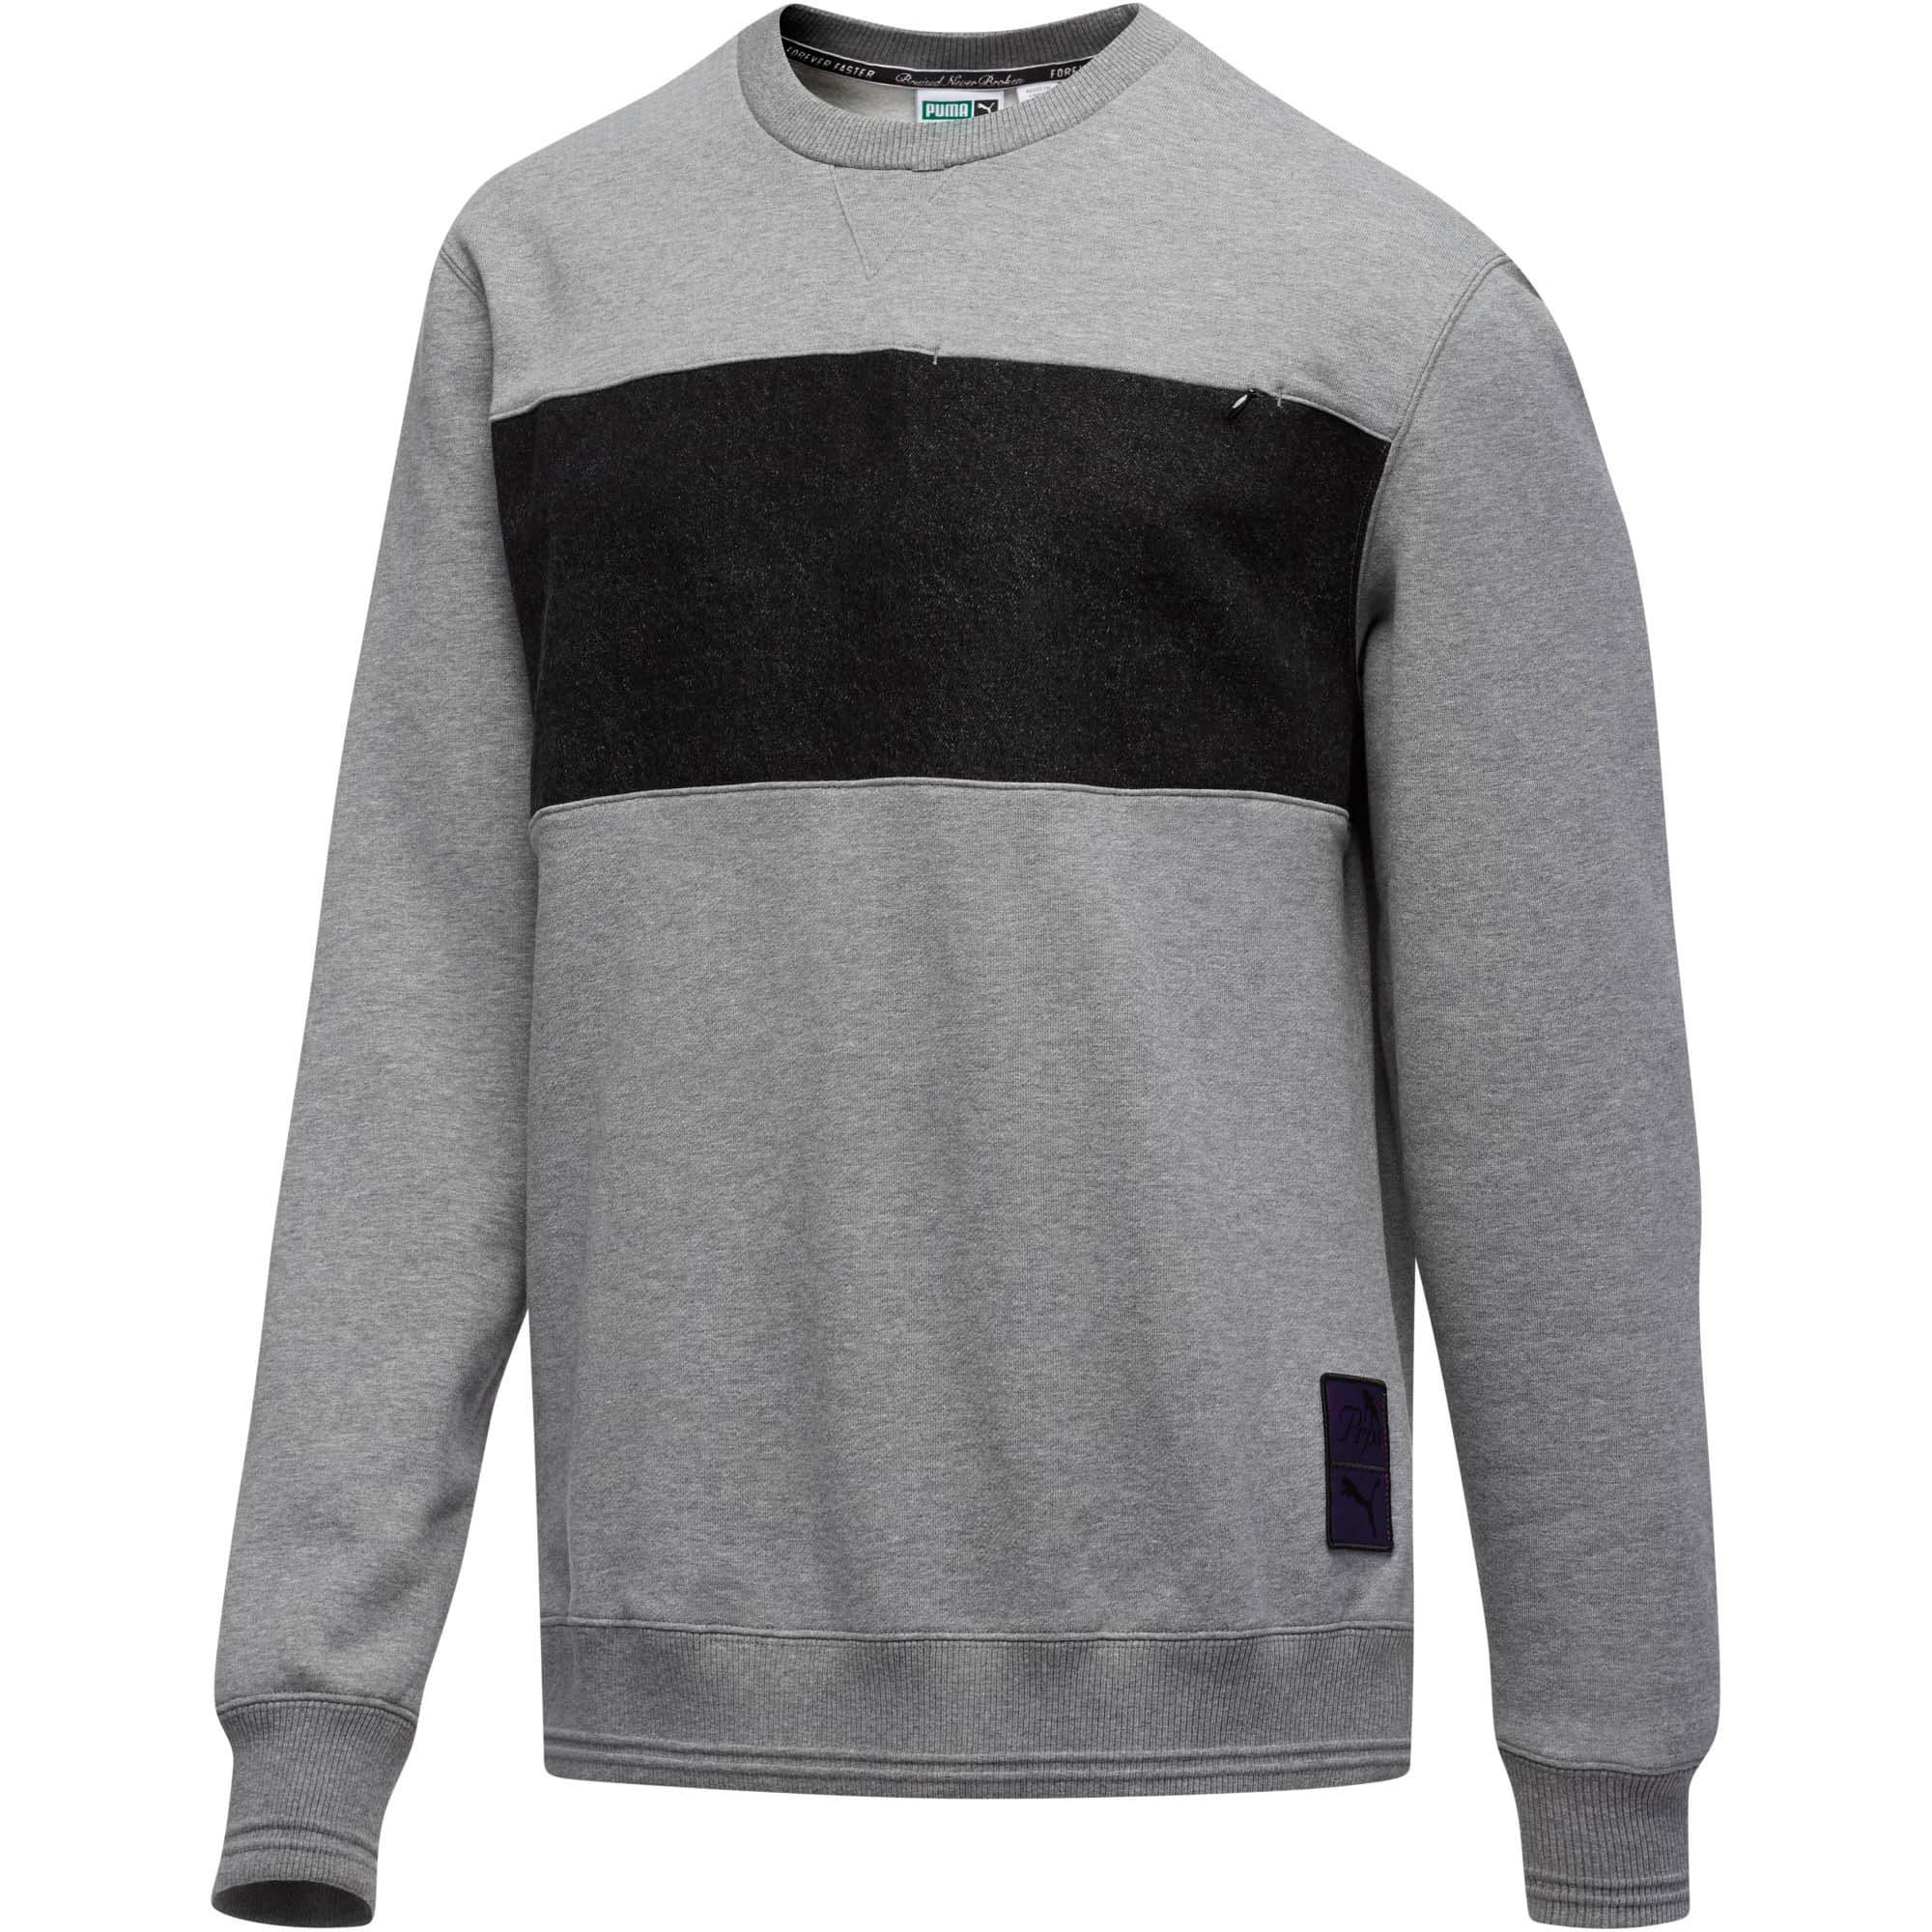 Thumbnail 1 of PUMA x PRPS Supply Men's Crewneck Sweatshirt, MGH-Puma Black, medium